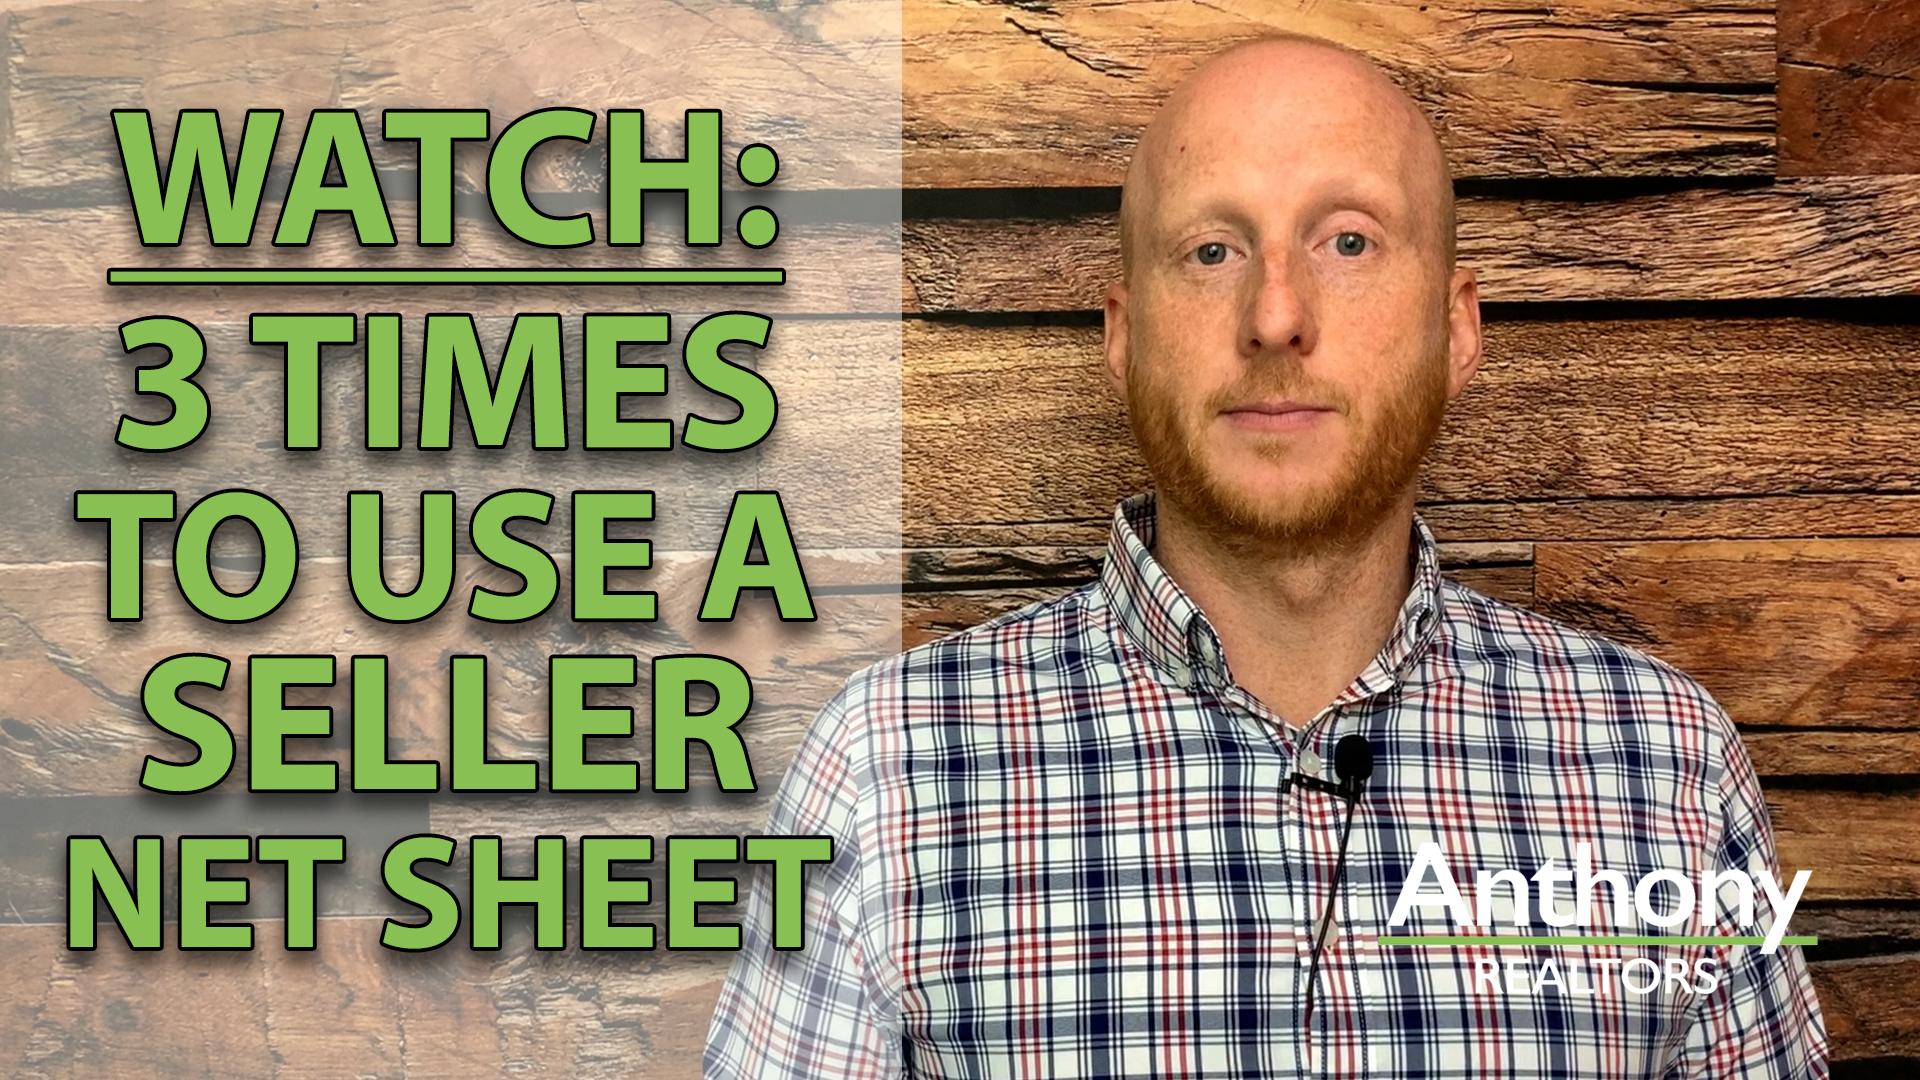 When to Use a Seller Net Sheet